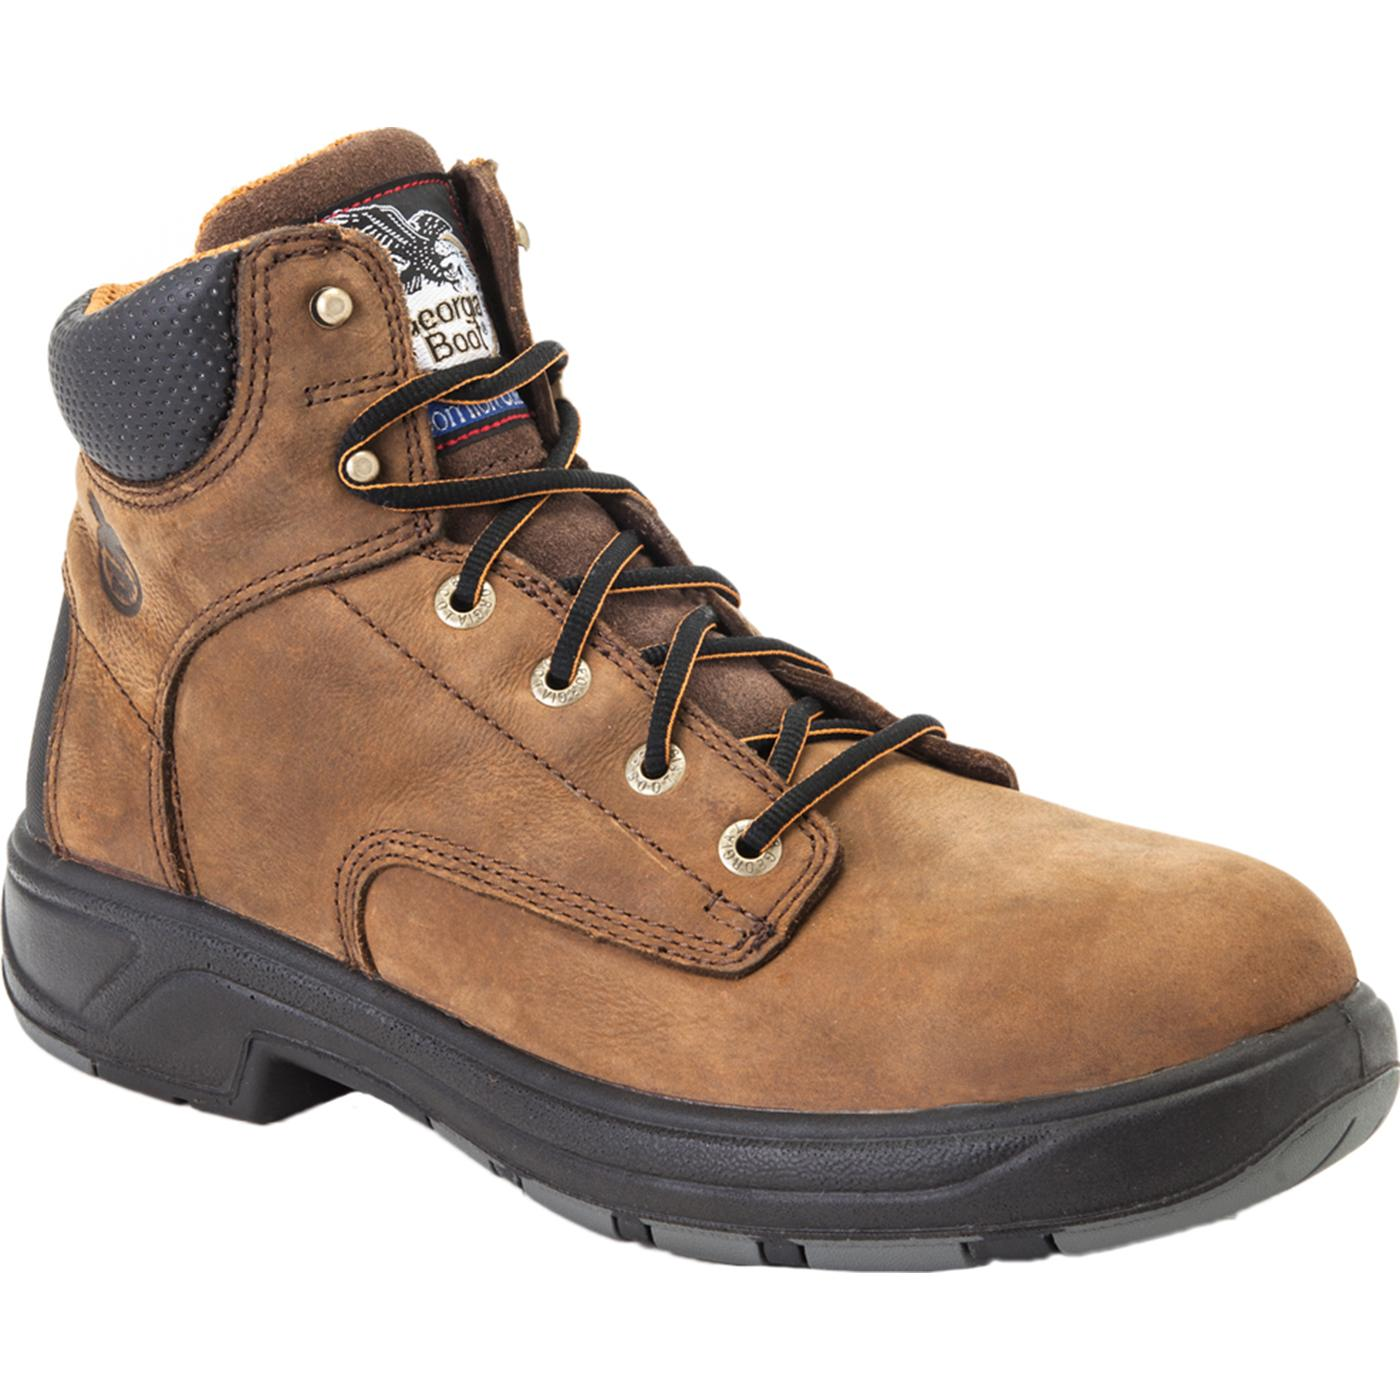 Georgia Boot Men S Flxpoint Composite Toe Work Footwear